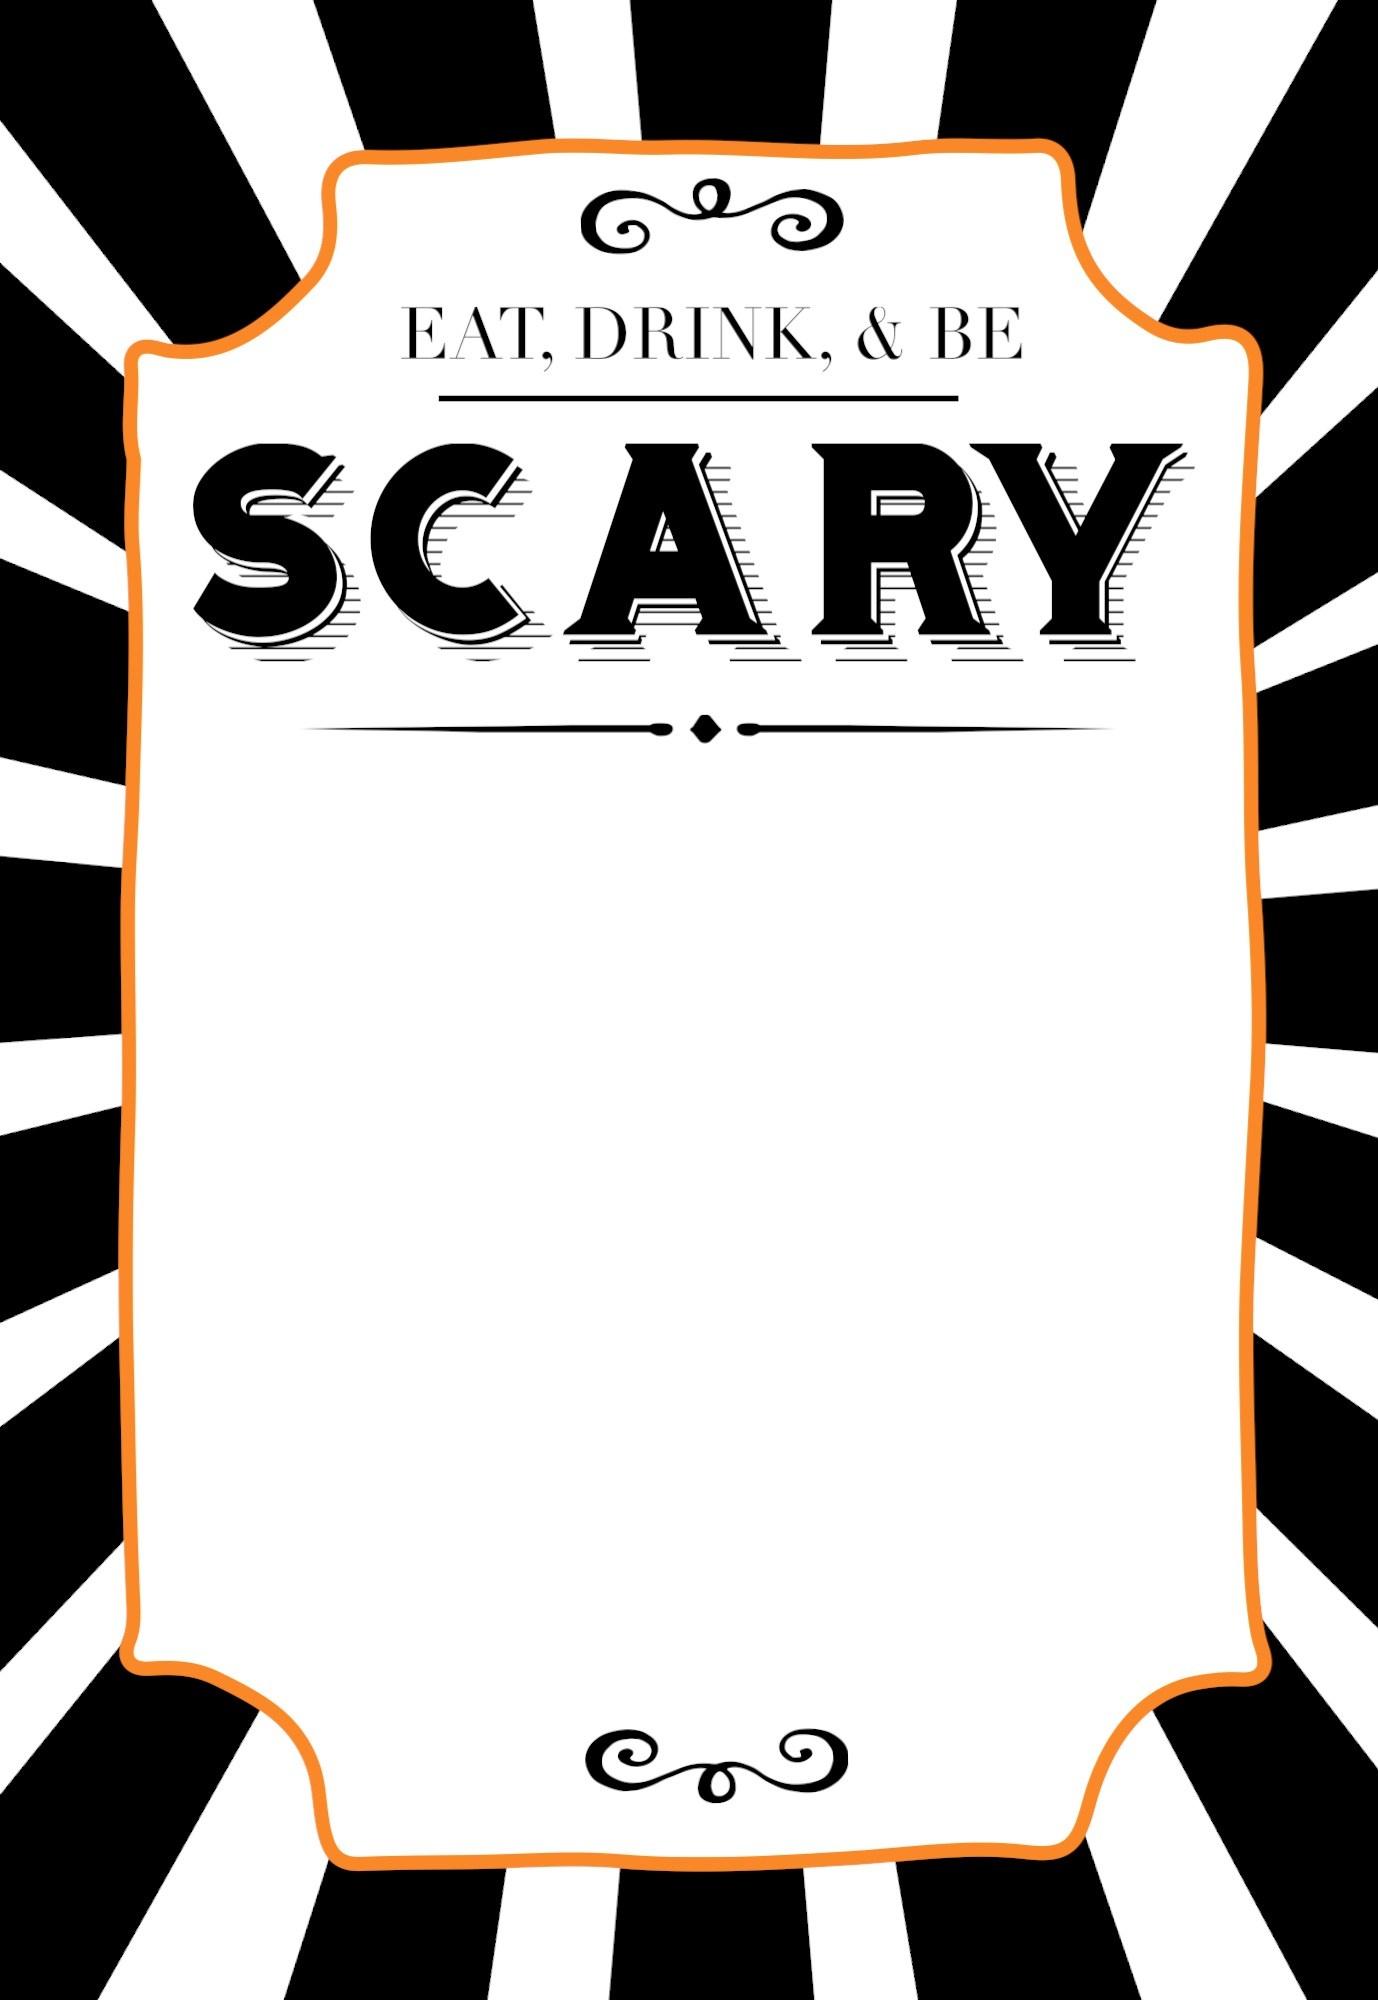 Halloween Invitations Free Printable Template - Paper Trail Design - Free Printable Halloween Invitations